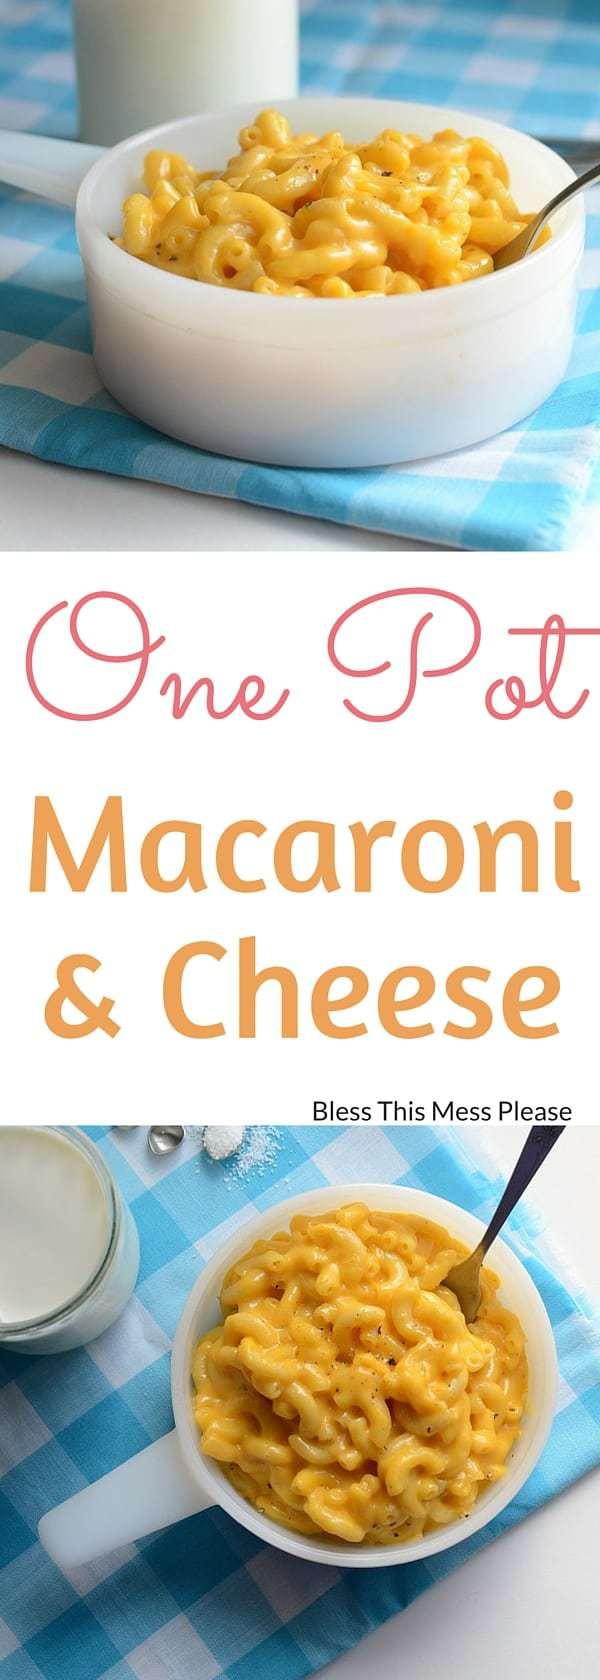 One Pot Macaroni and Cheese